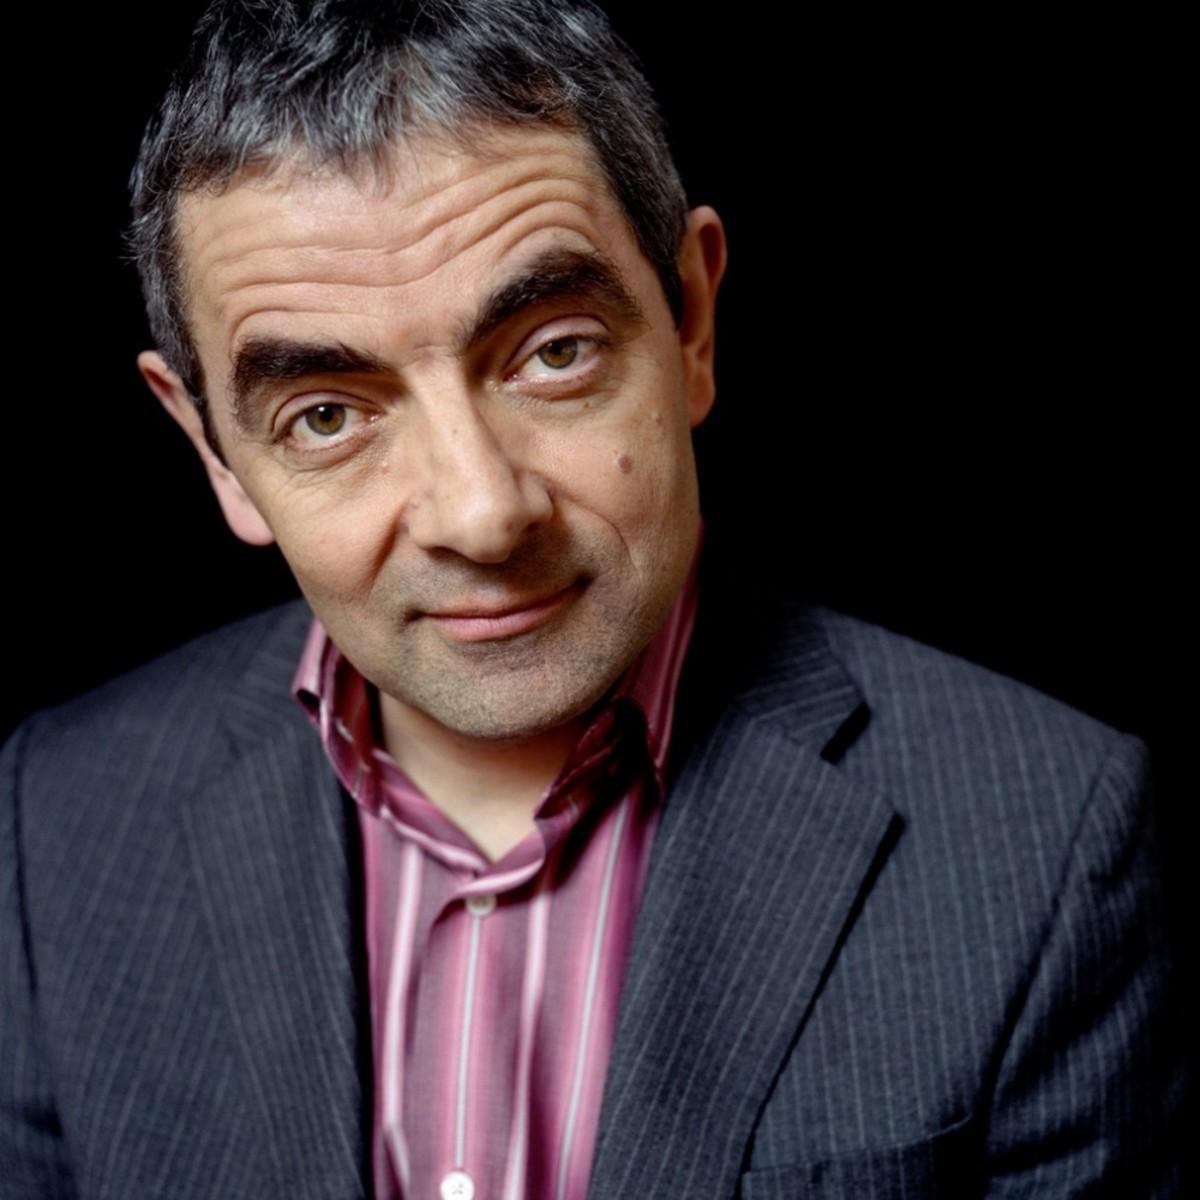 The Real Rowan Atkinson